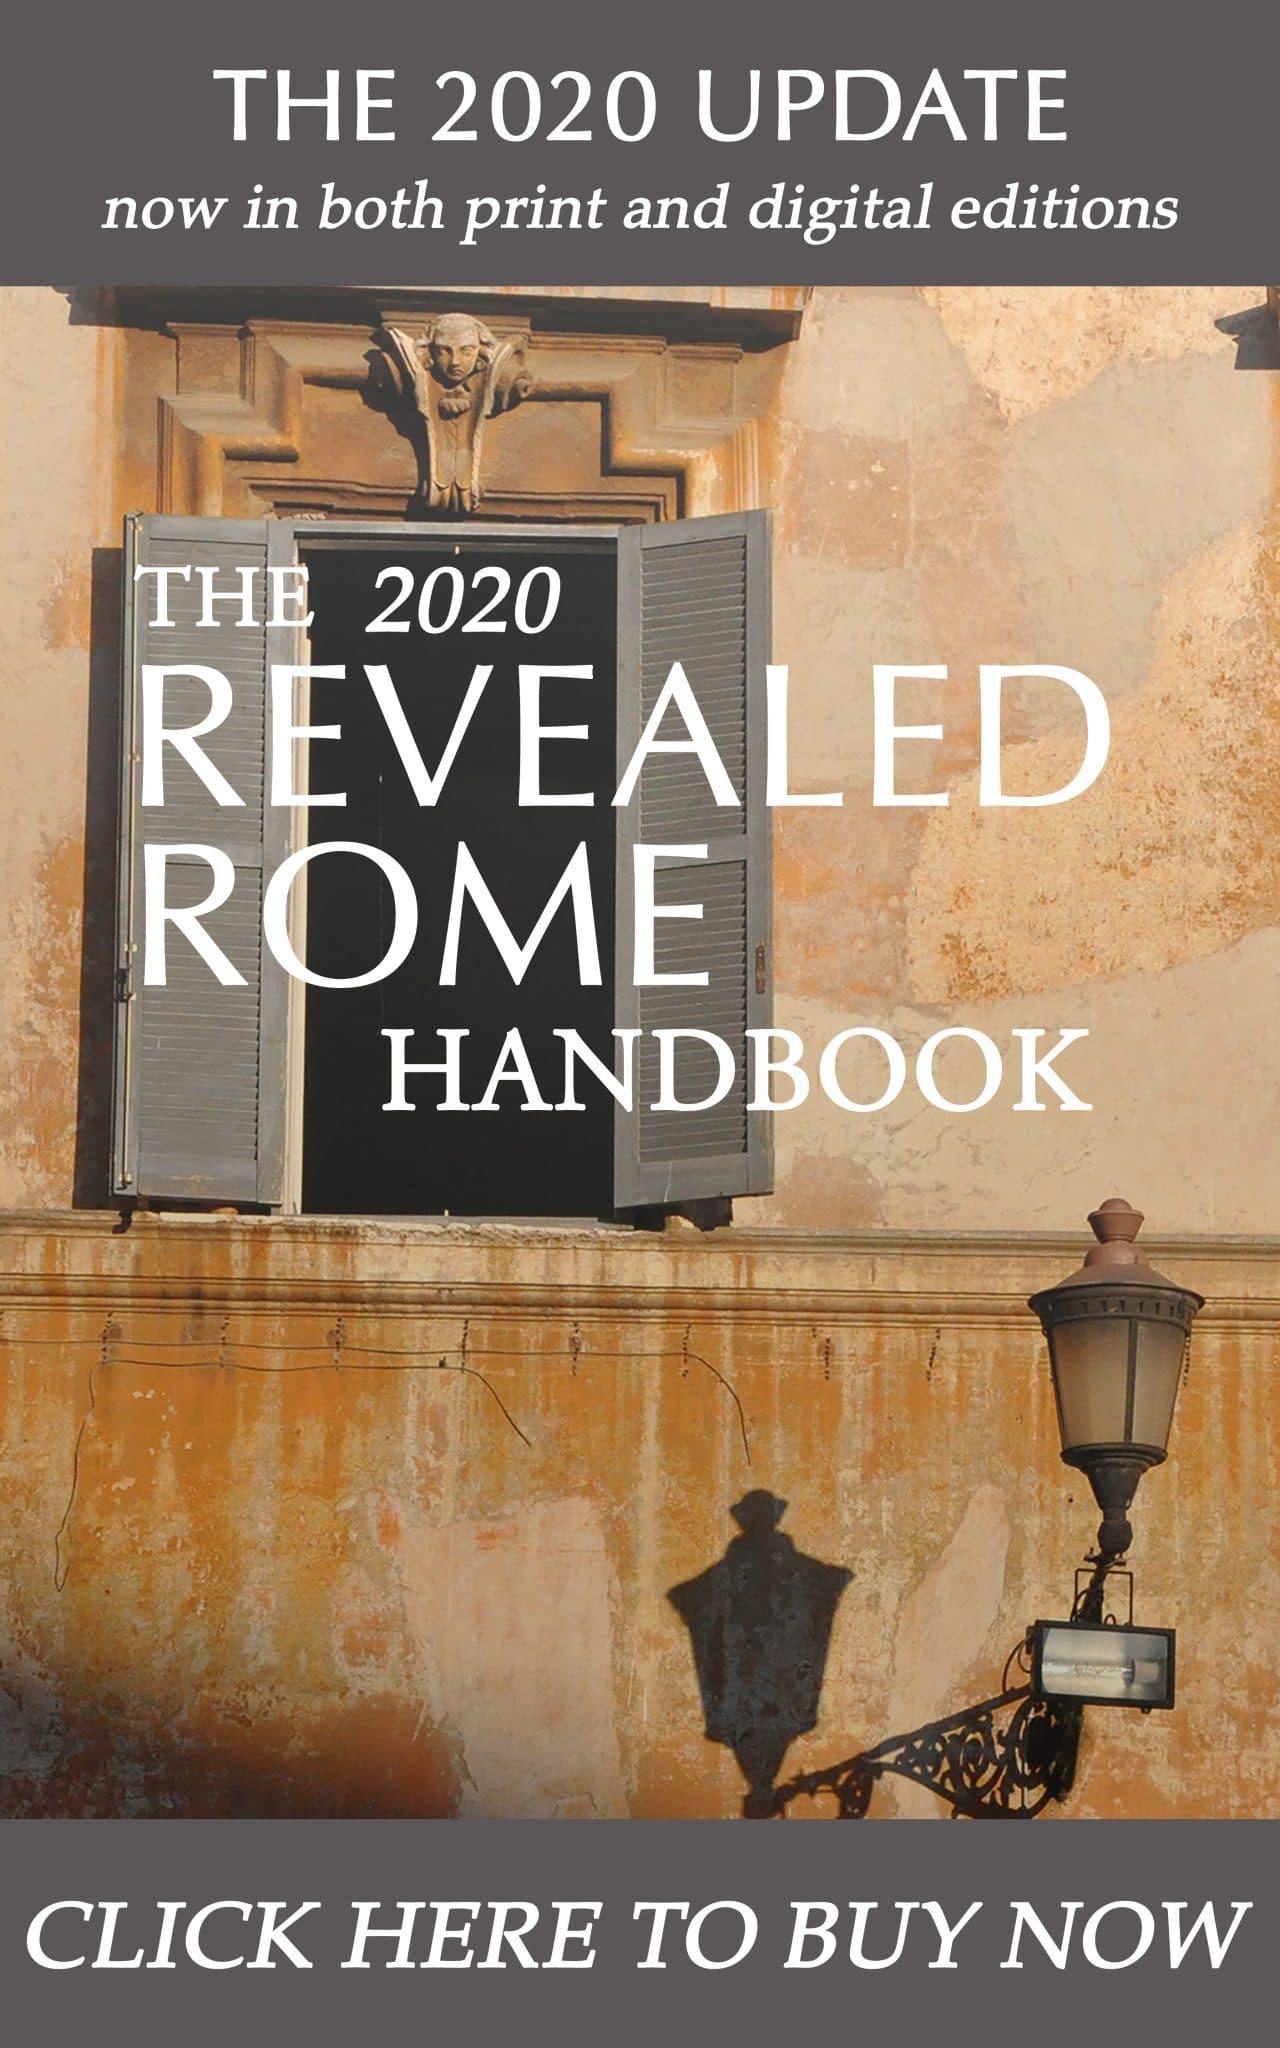 The Revealed Rome Handbook